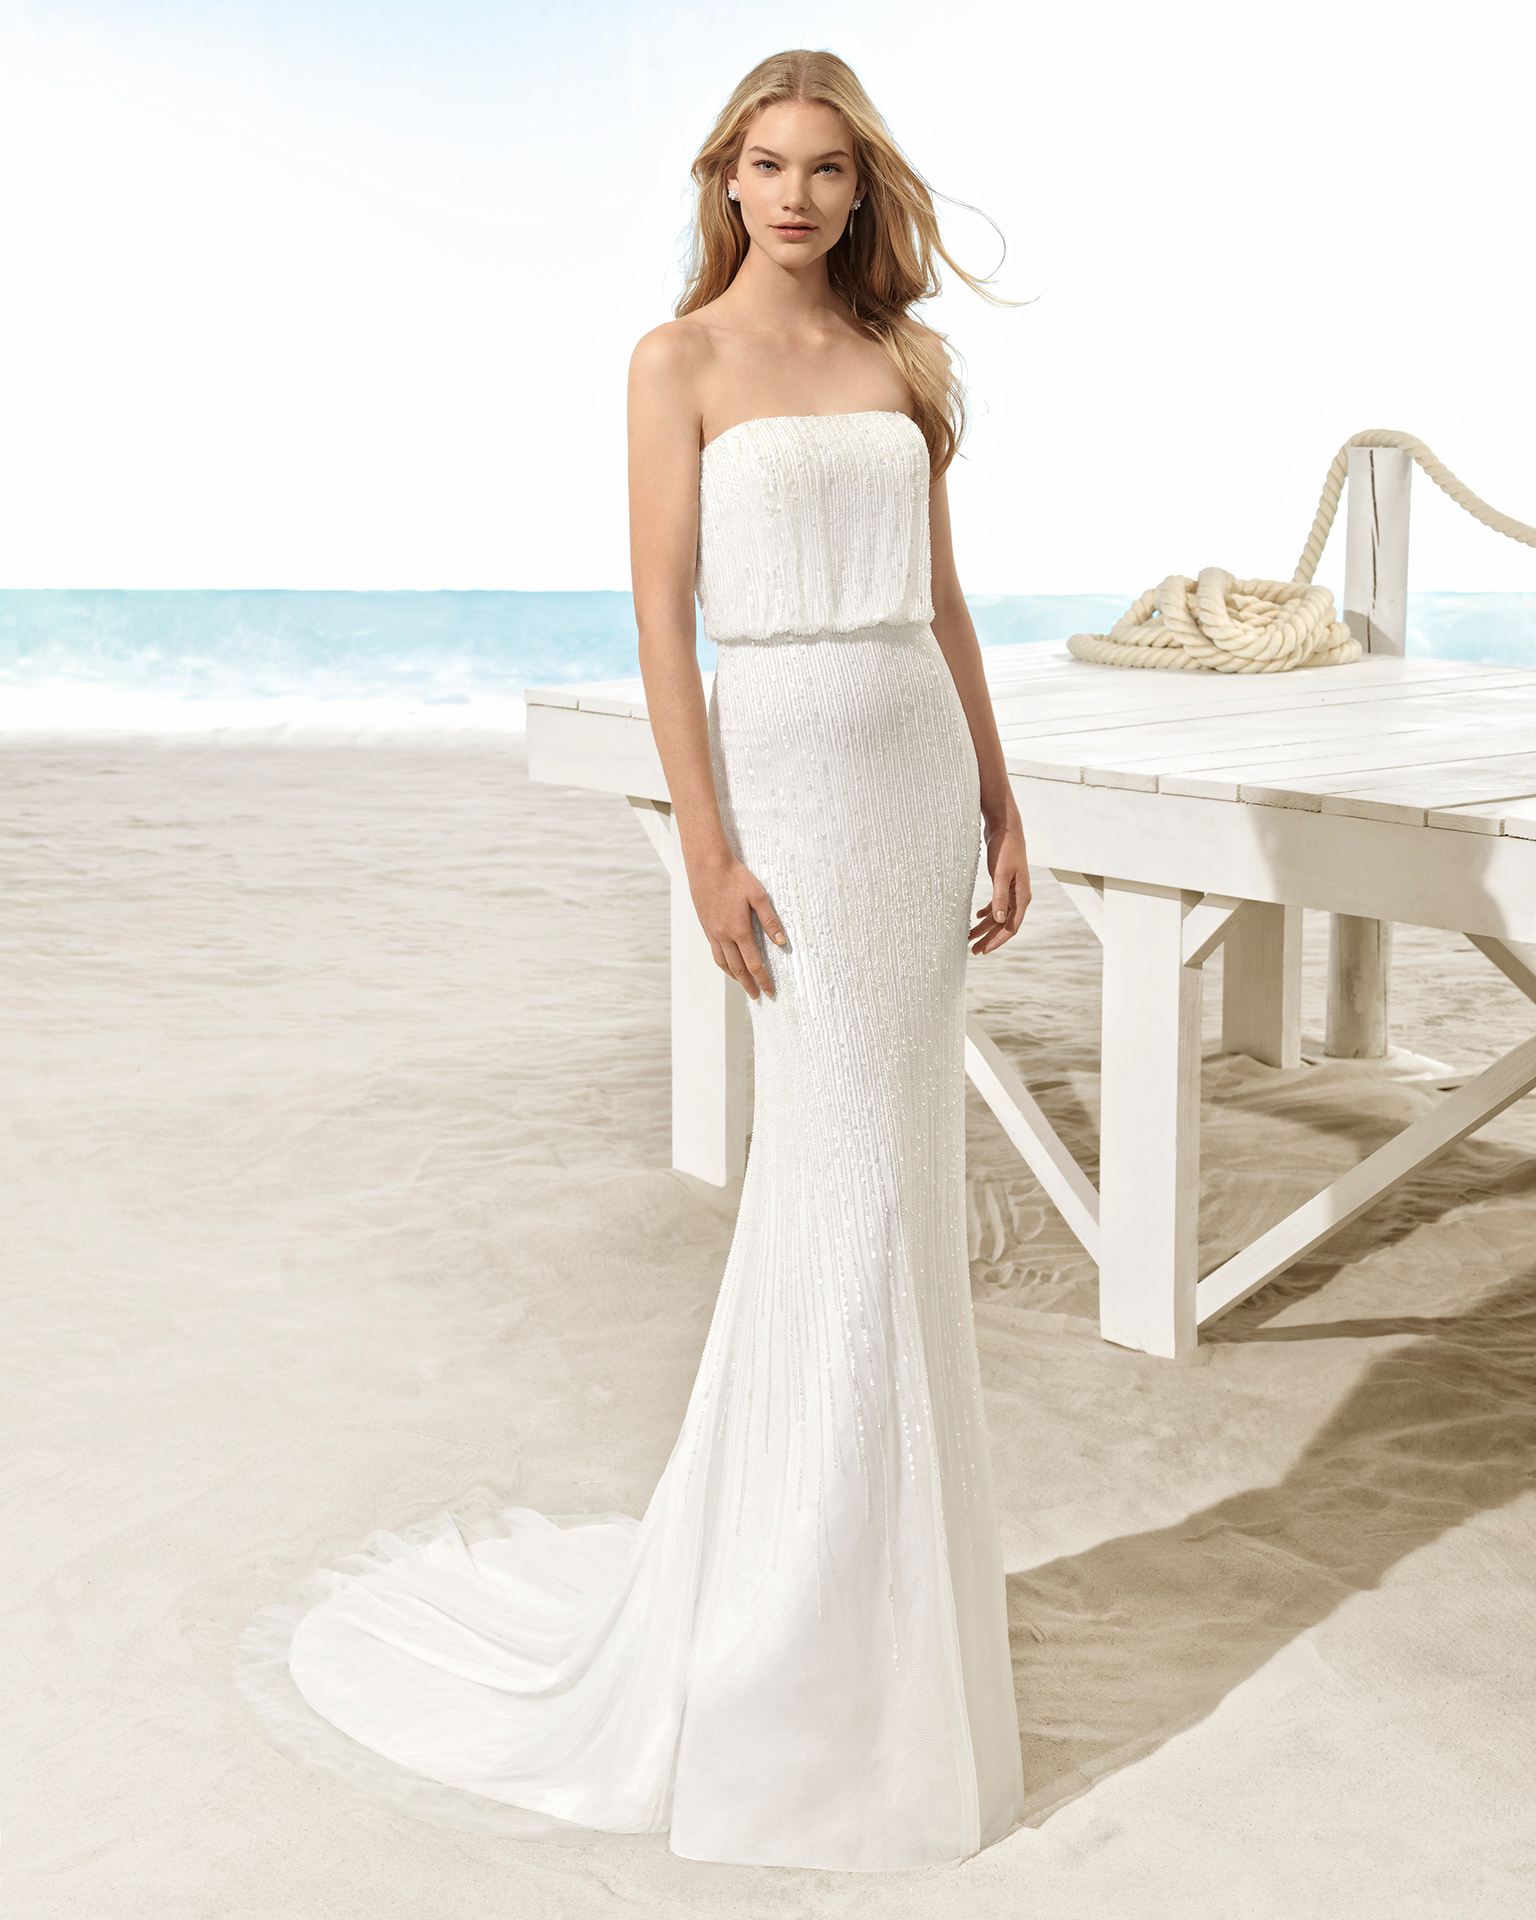 Boho-style beaded strapless wedding dress with bloused bodice.